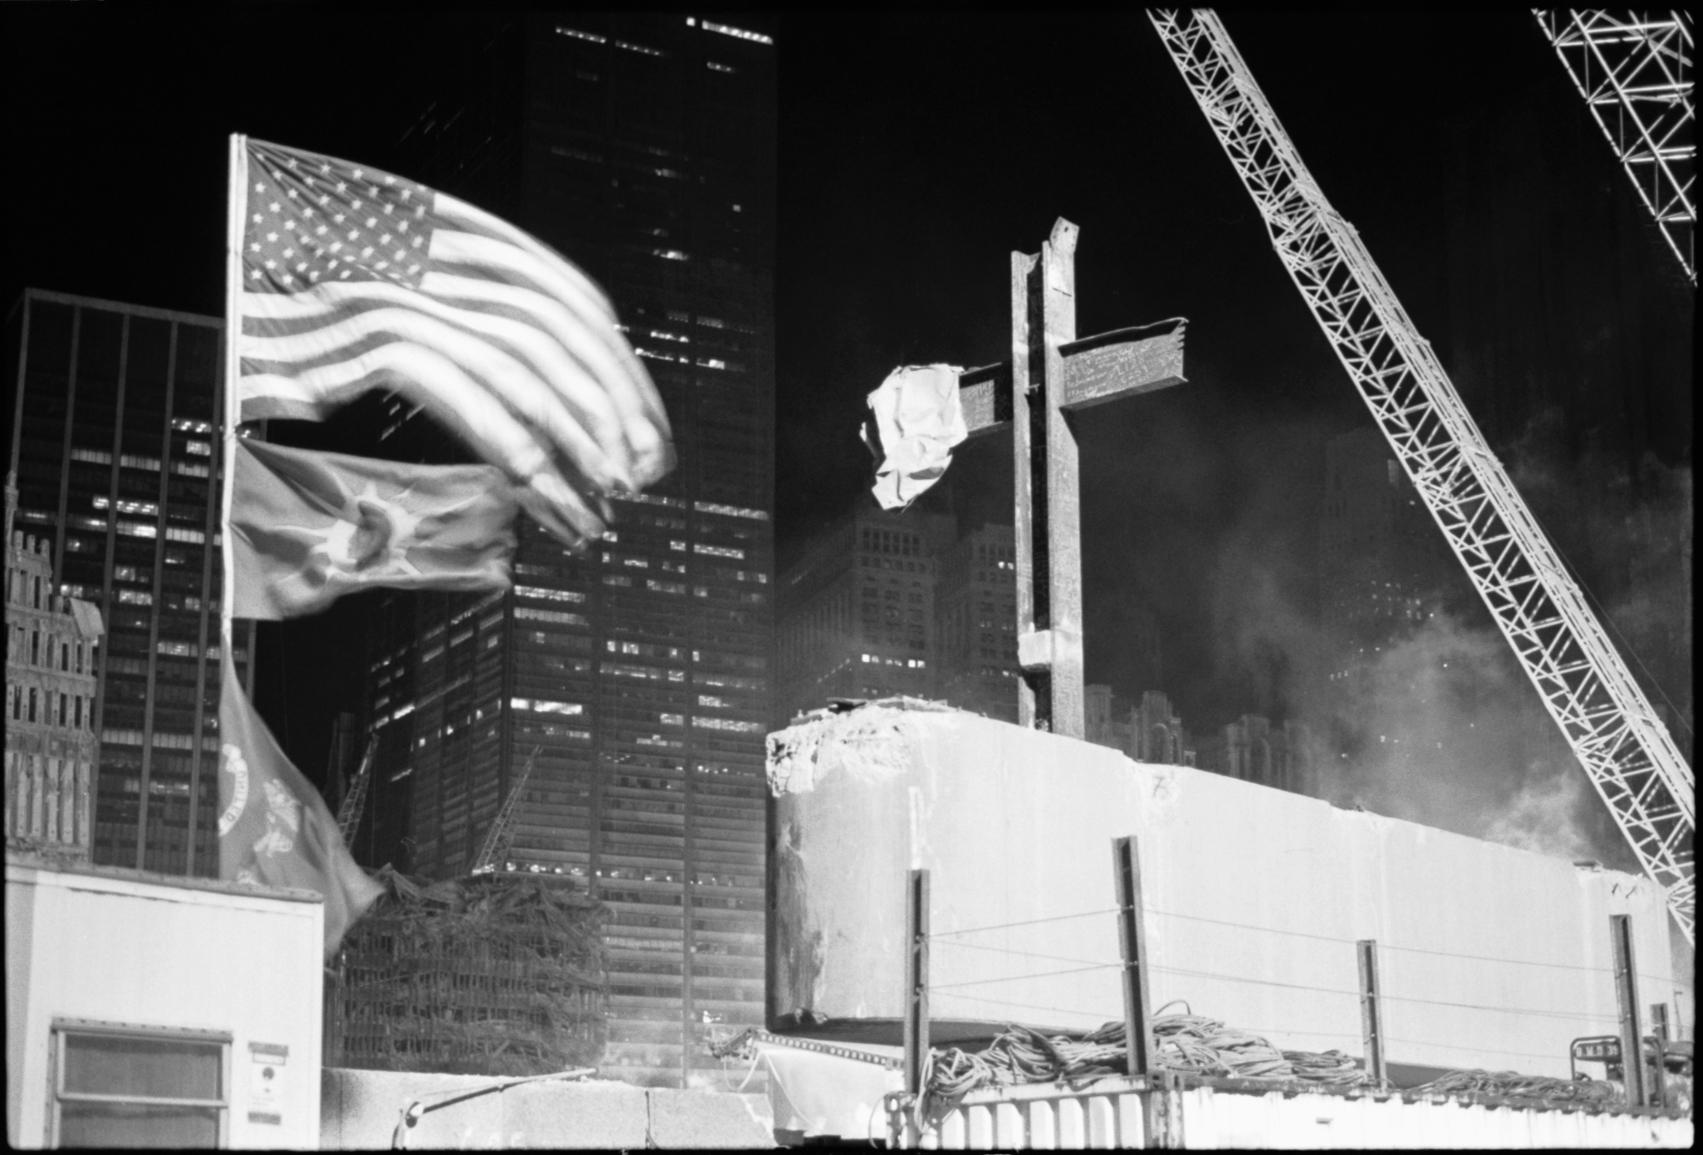 2001_WTC_R033_26.jpg